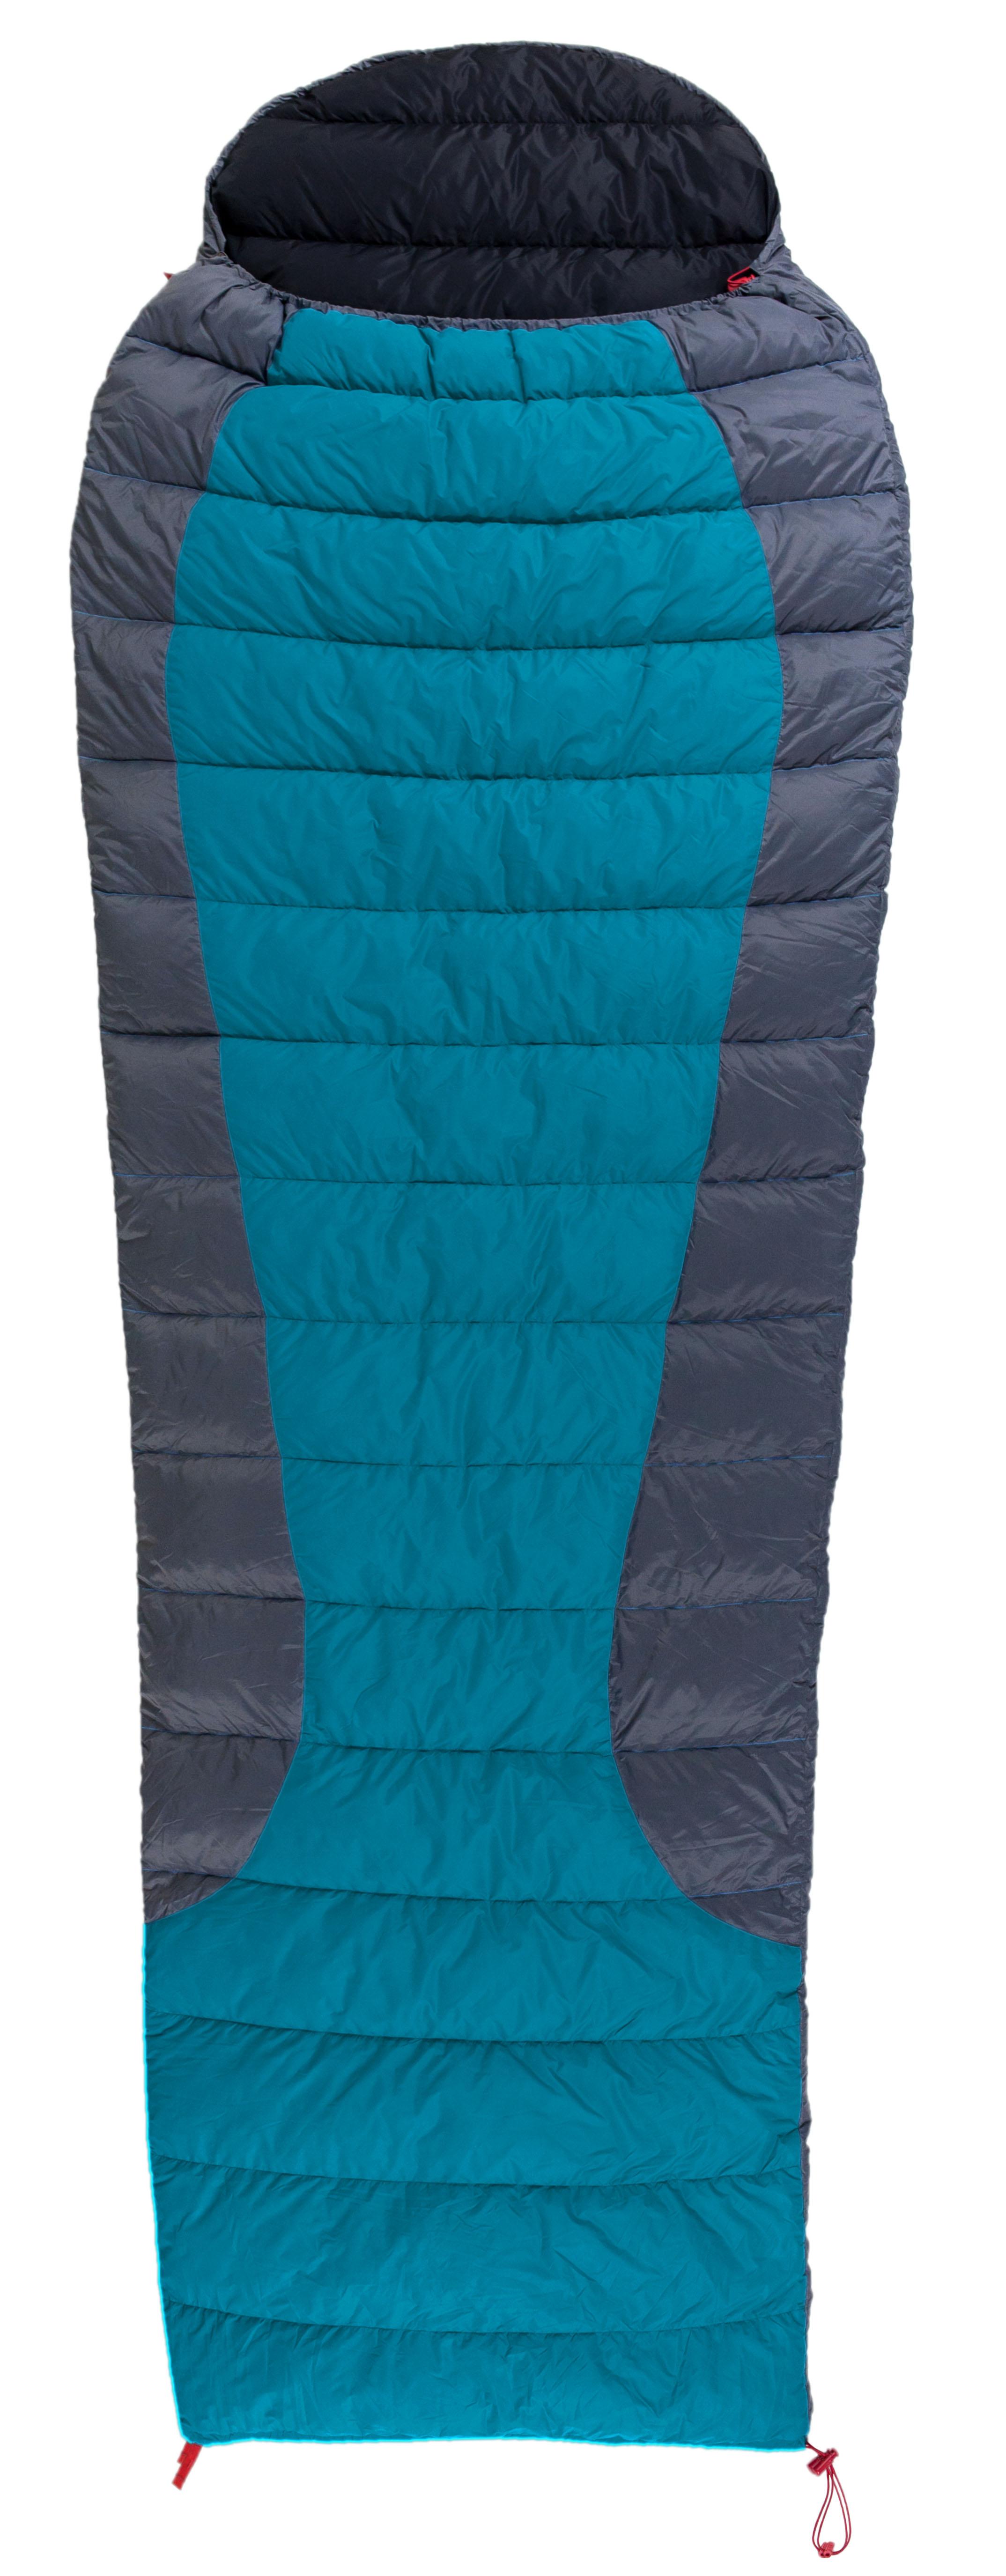 Warmpeace spací pytel Viking Blanket Barva: Modrá, Zip: pravý, Velikost (cm): 195